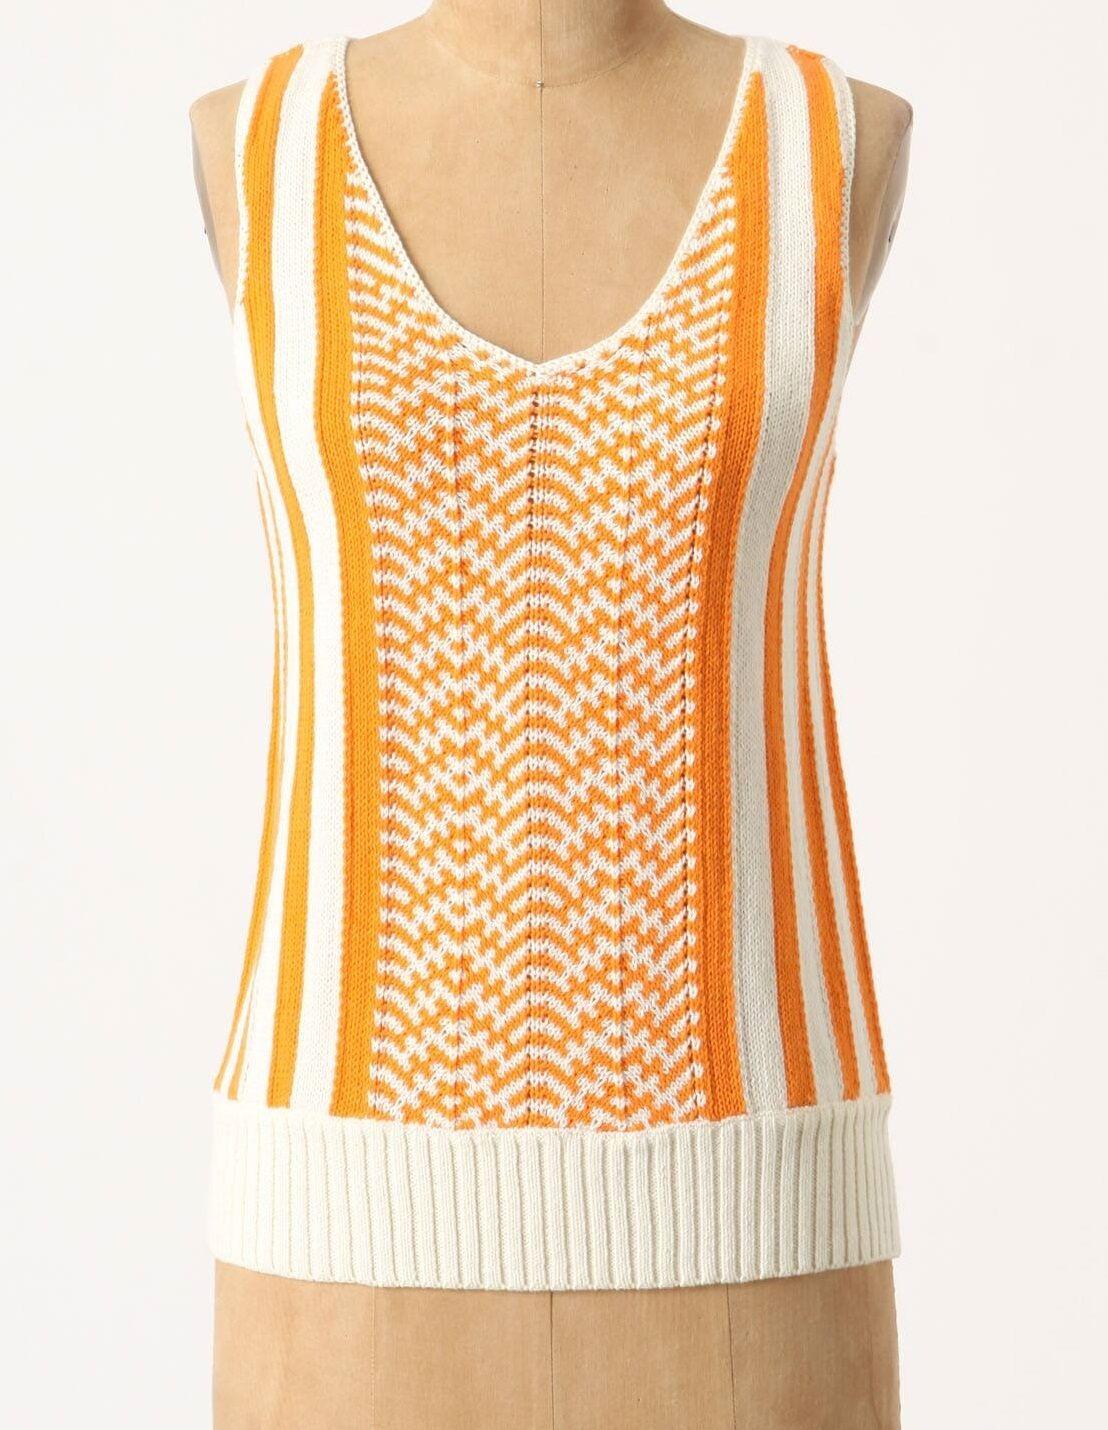 Fiets Voor 2 Neonsicle Knit Tank Top Medium, Large orange NW ANTHROPOLOGIE Tag